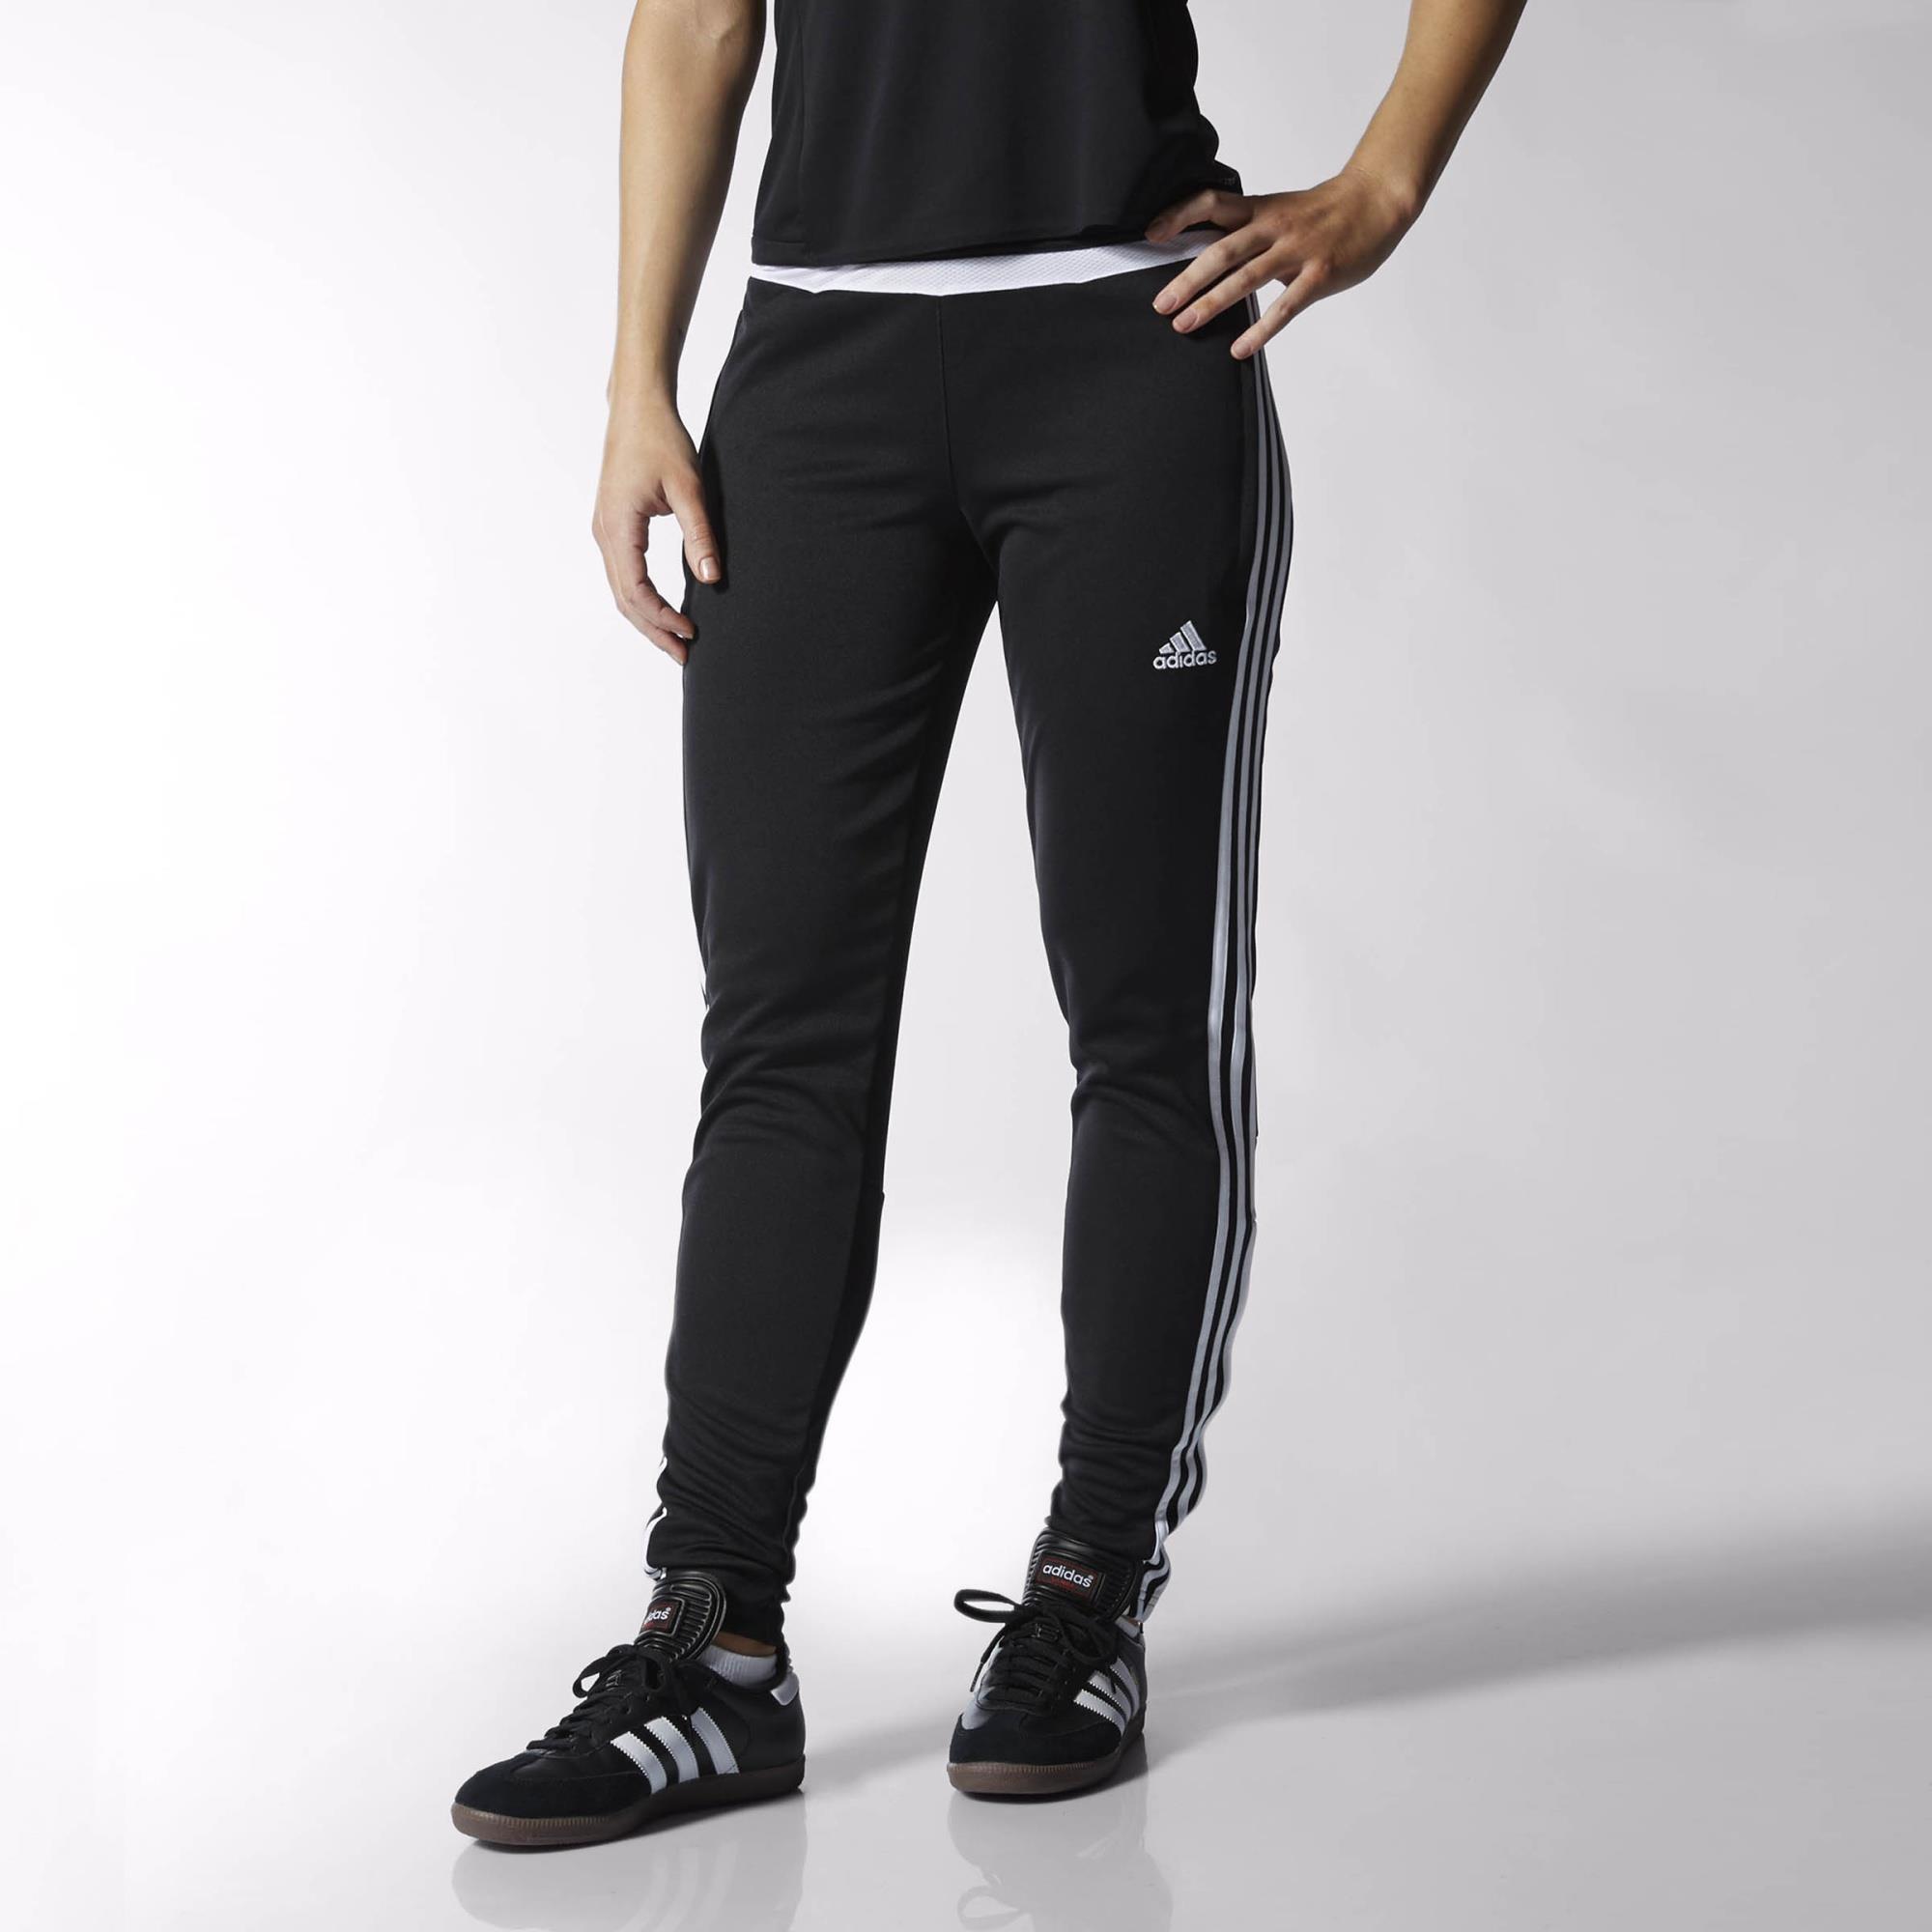 35c573666 adidas Tiro 15 Training Pants | adidas US